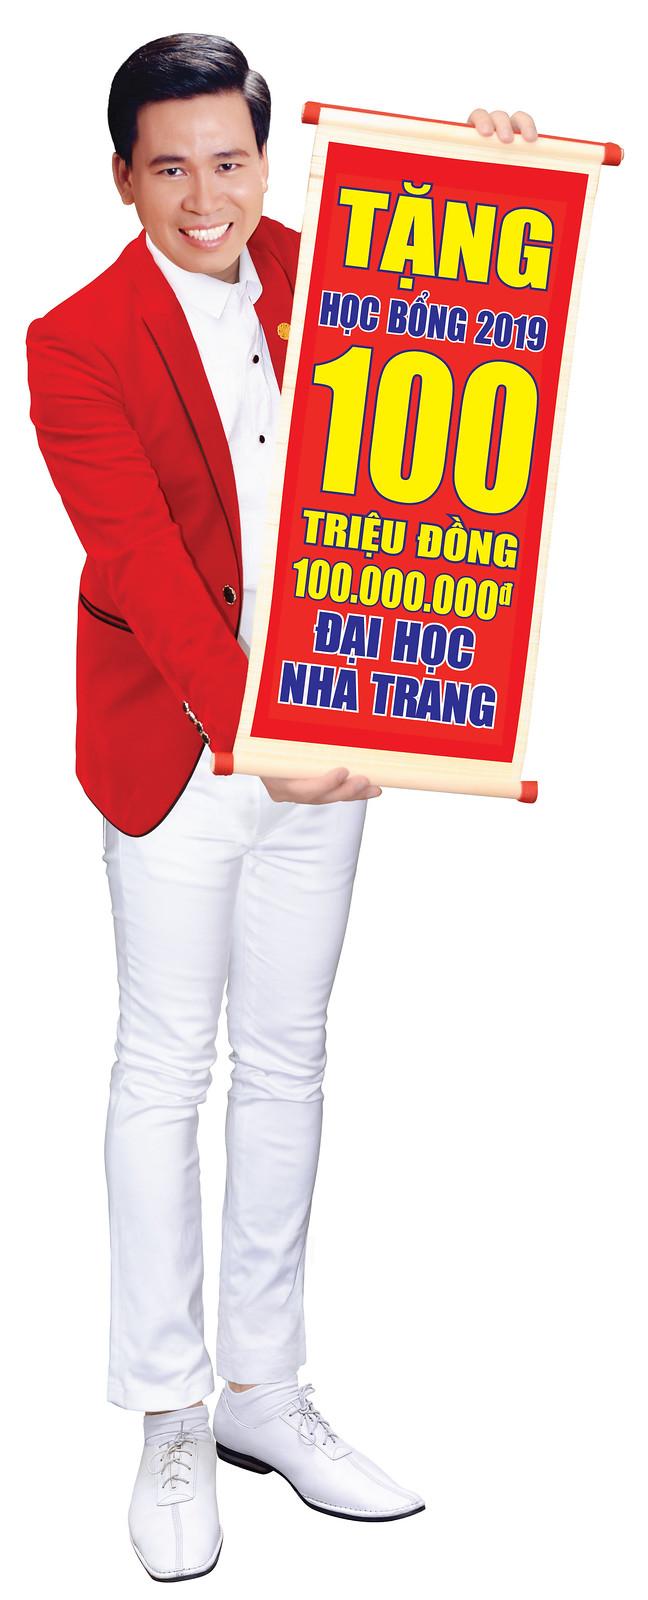 thuong 250 triệu-01